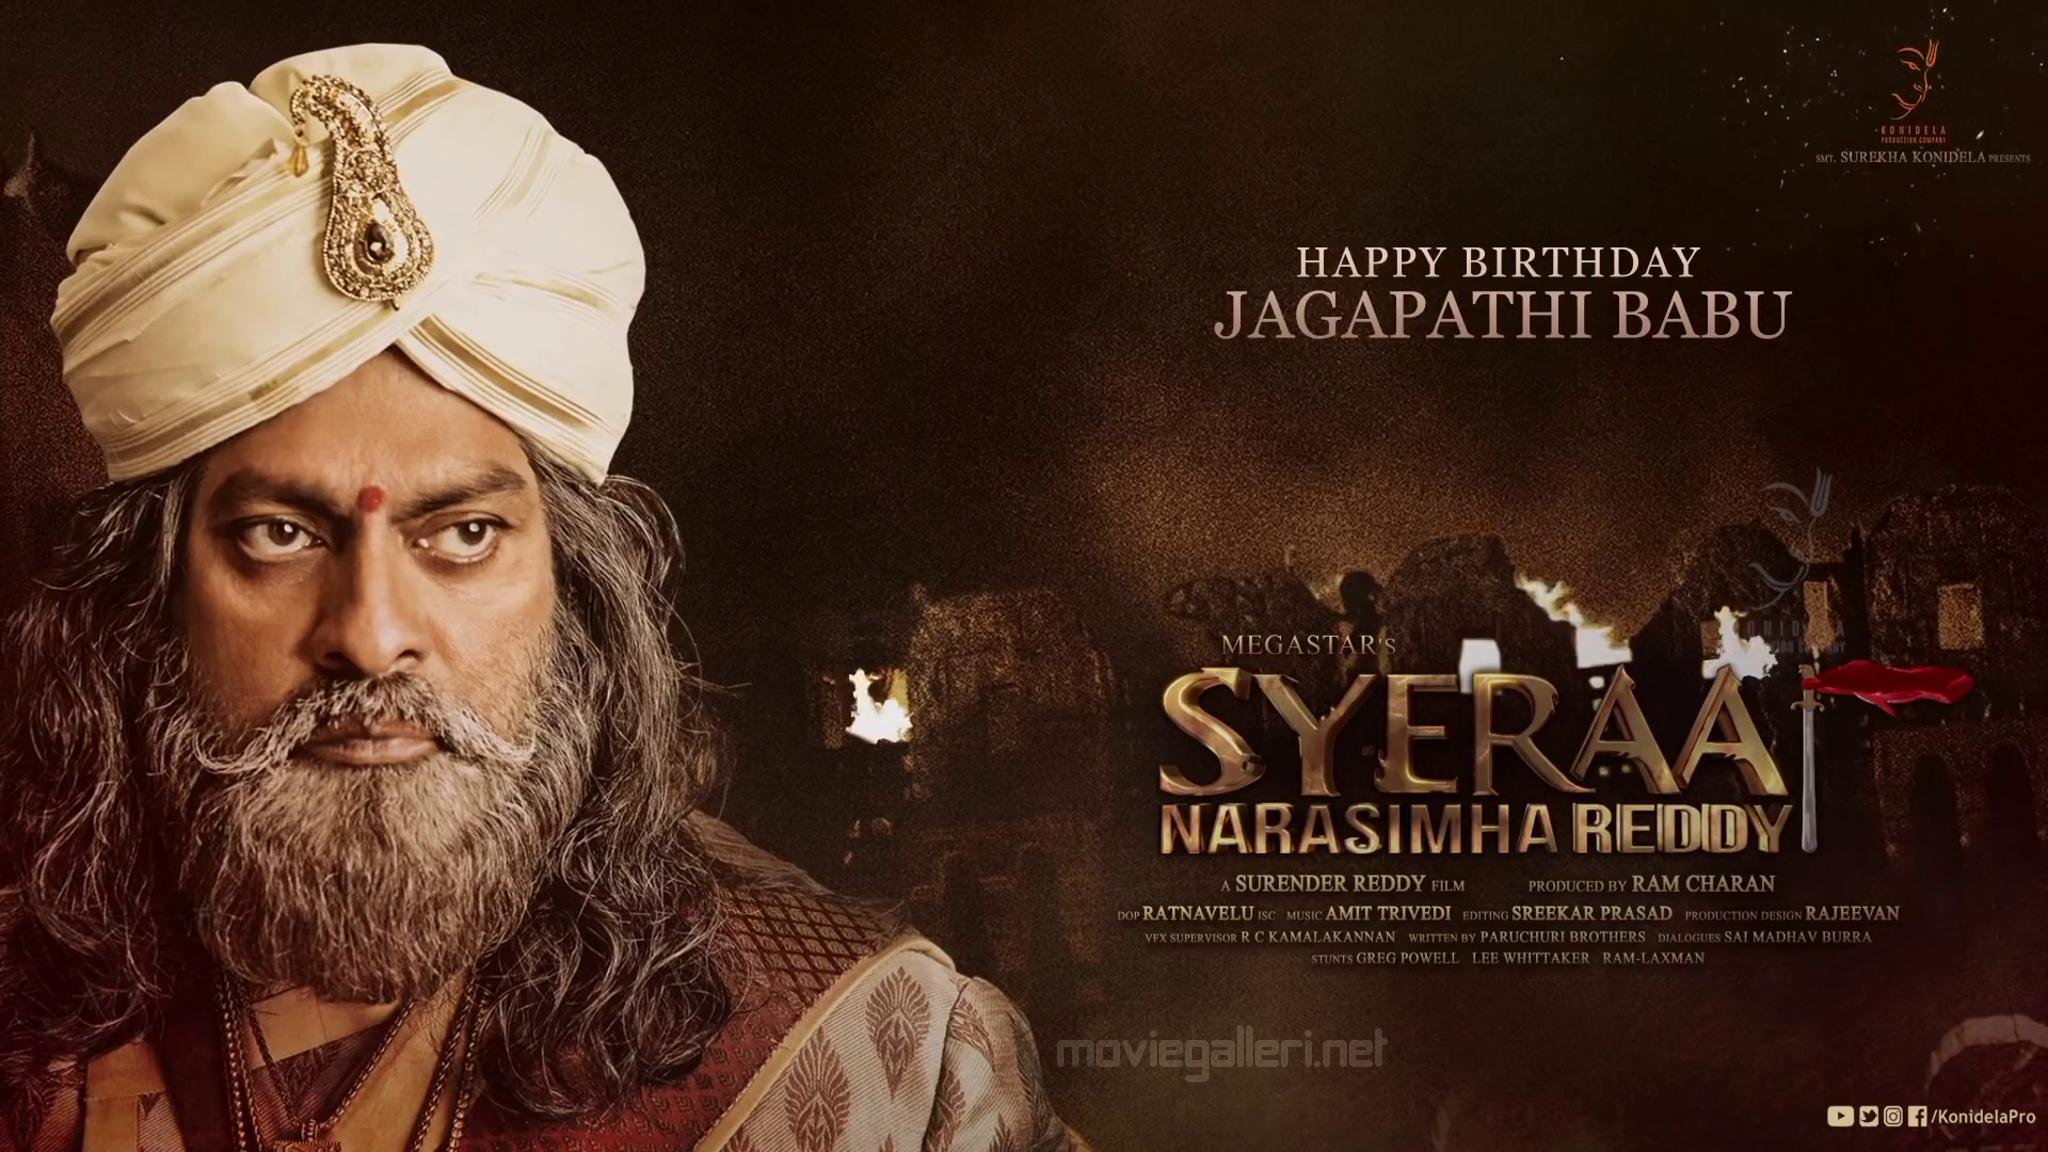 Jagapathi Babu Birthday Wishes From Sye Raa Narasimha Reddy